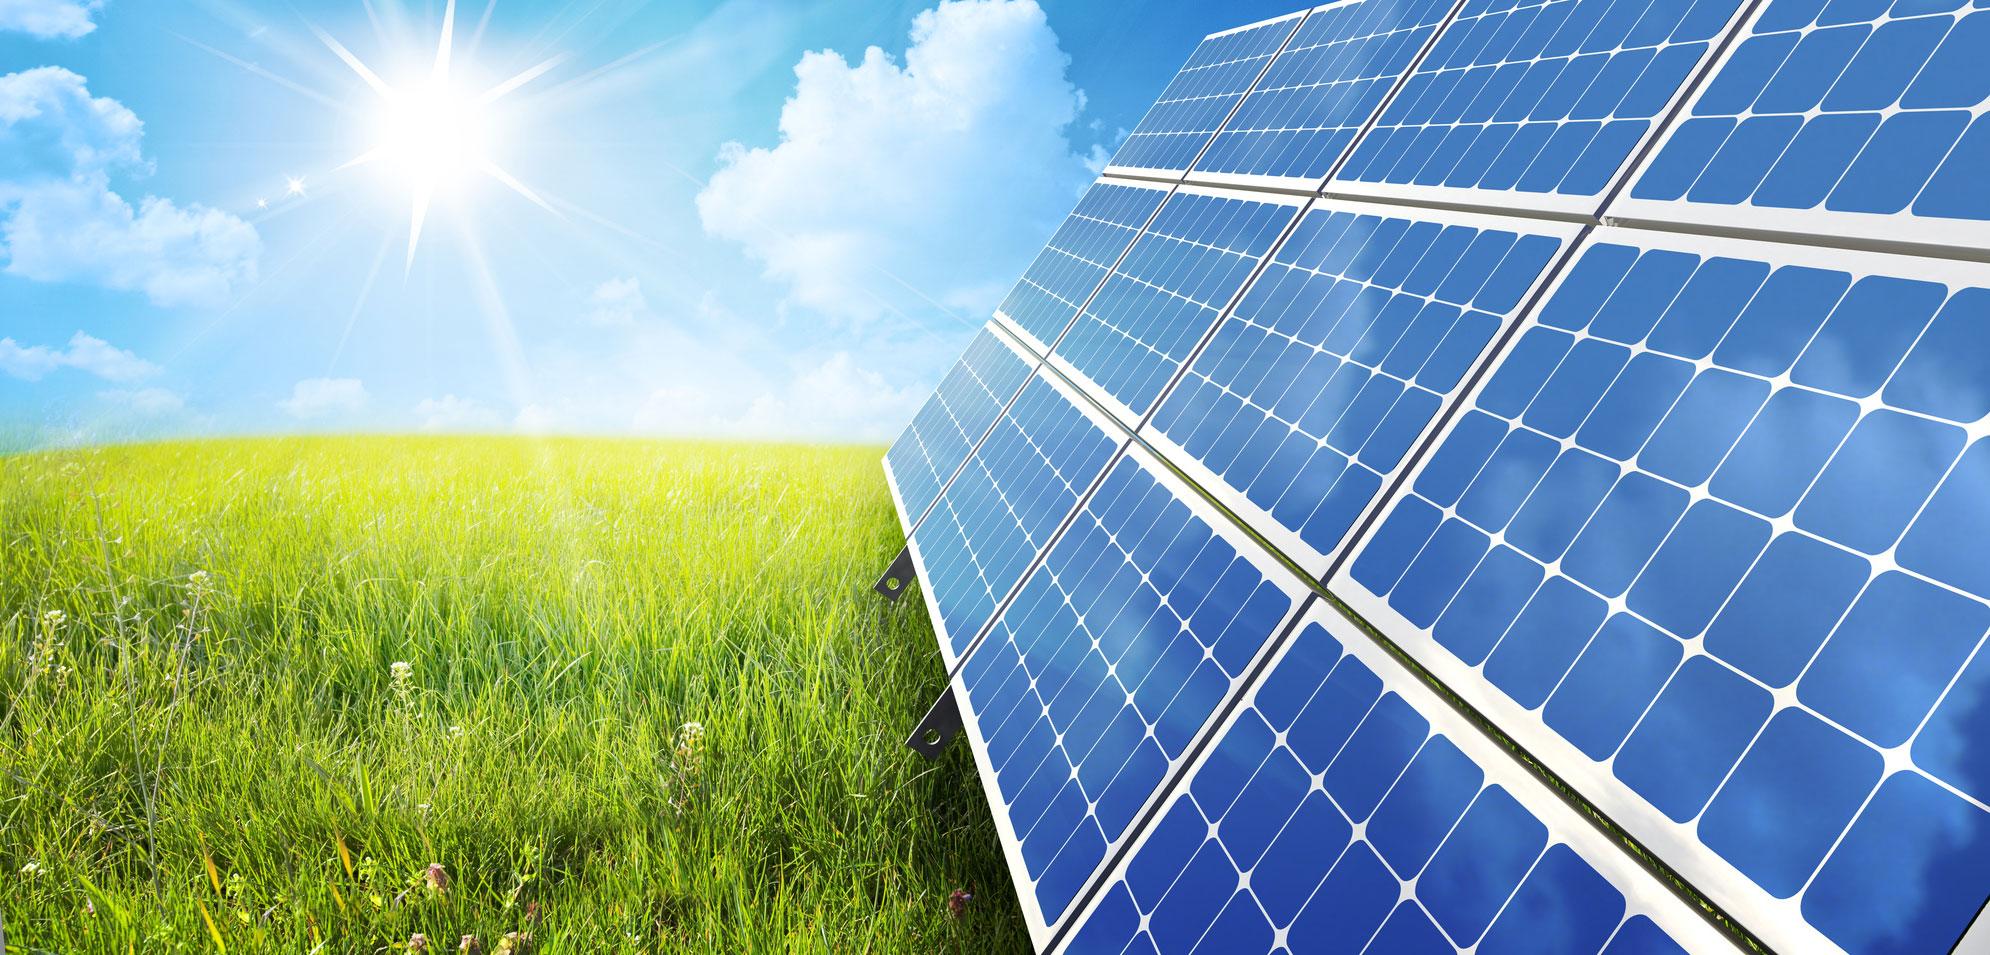 Impianti fotovoltaici sunpower tesla powerwall a massa for Pannelli solari immagini